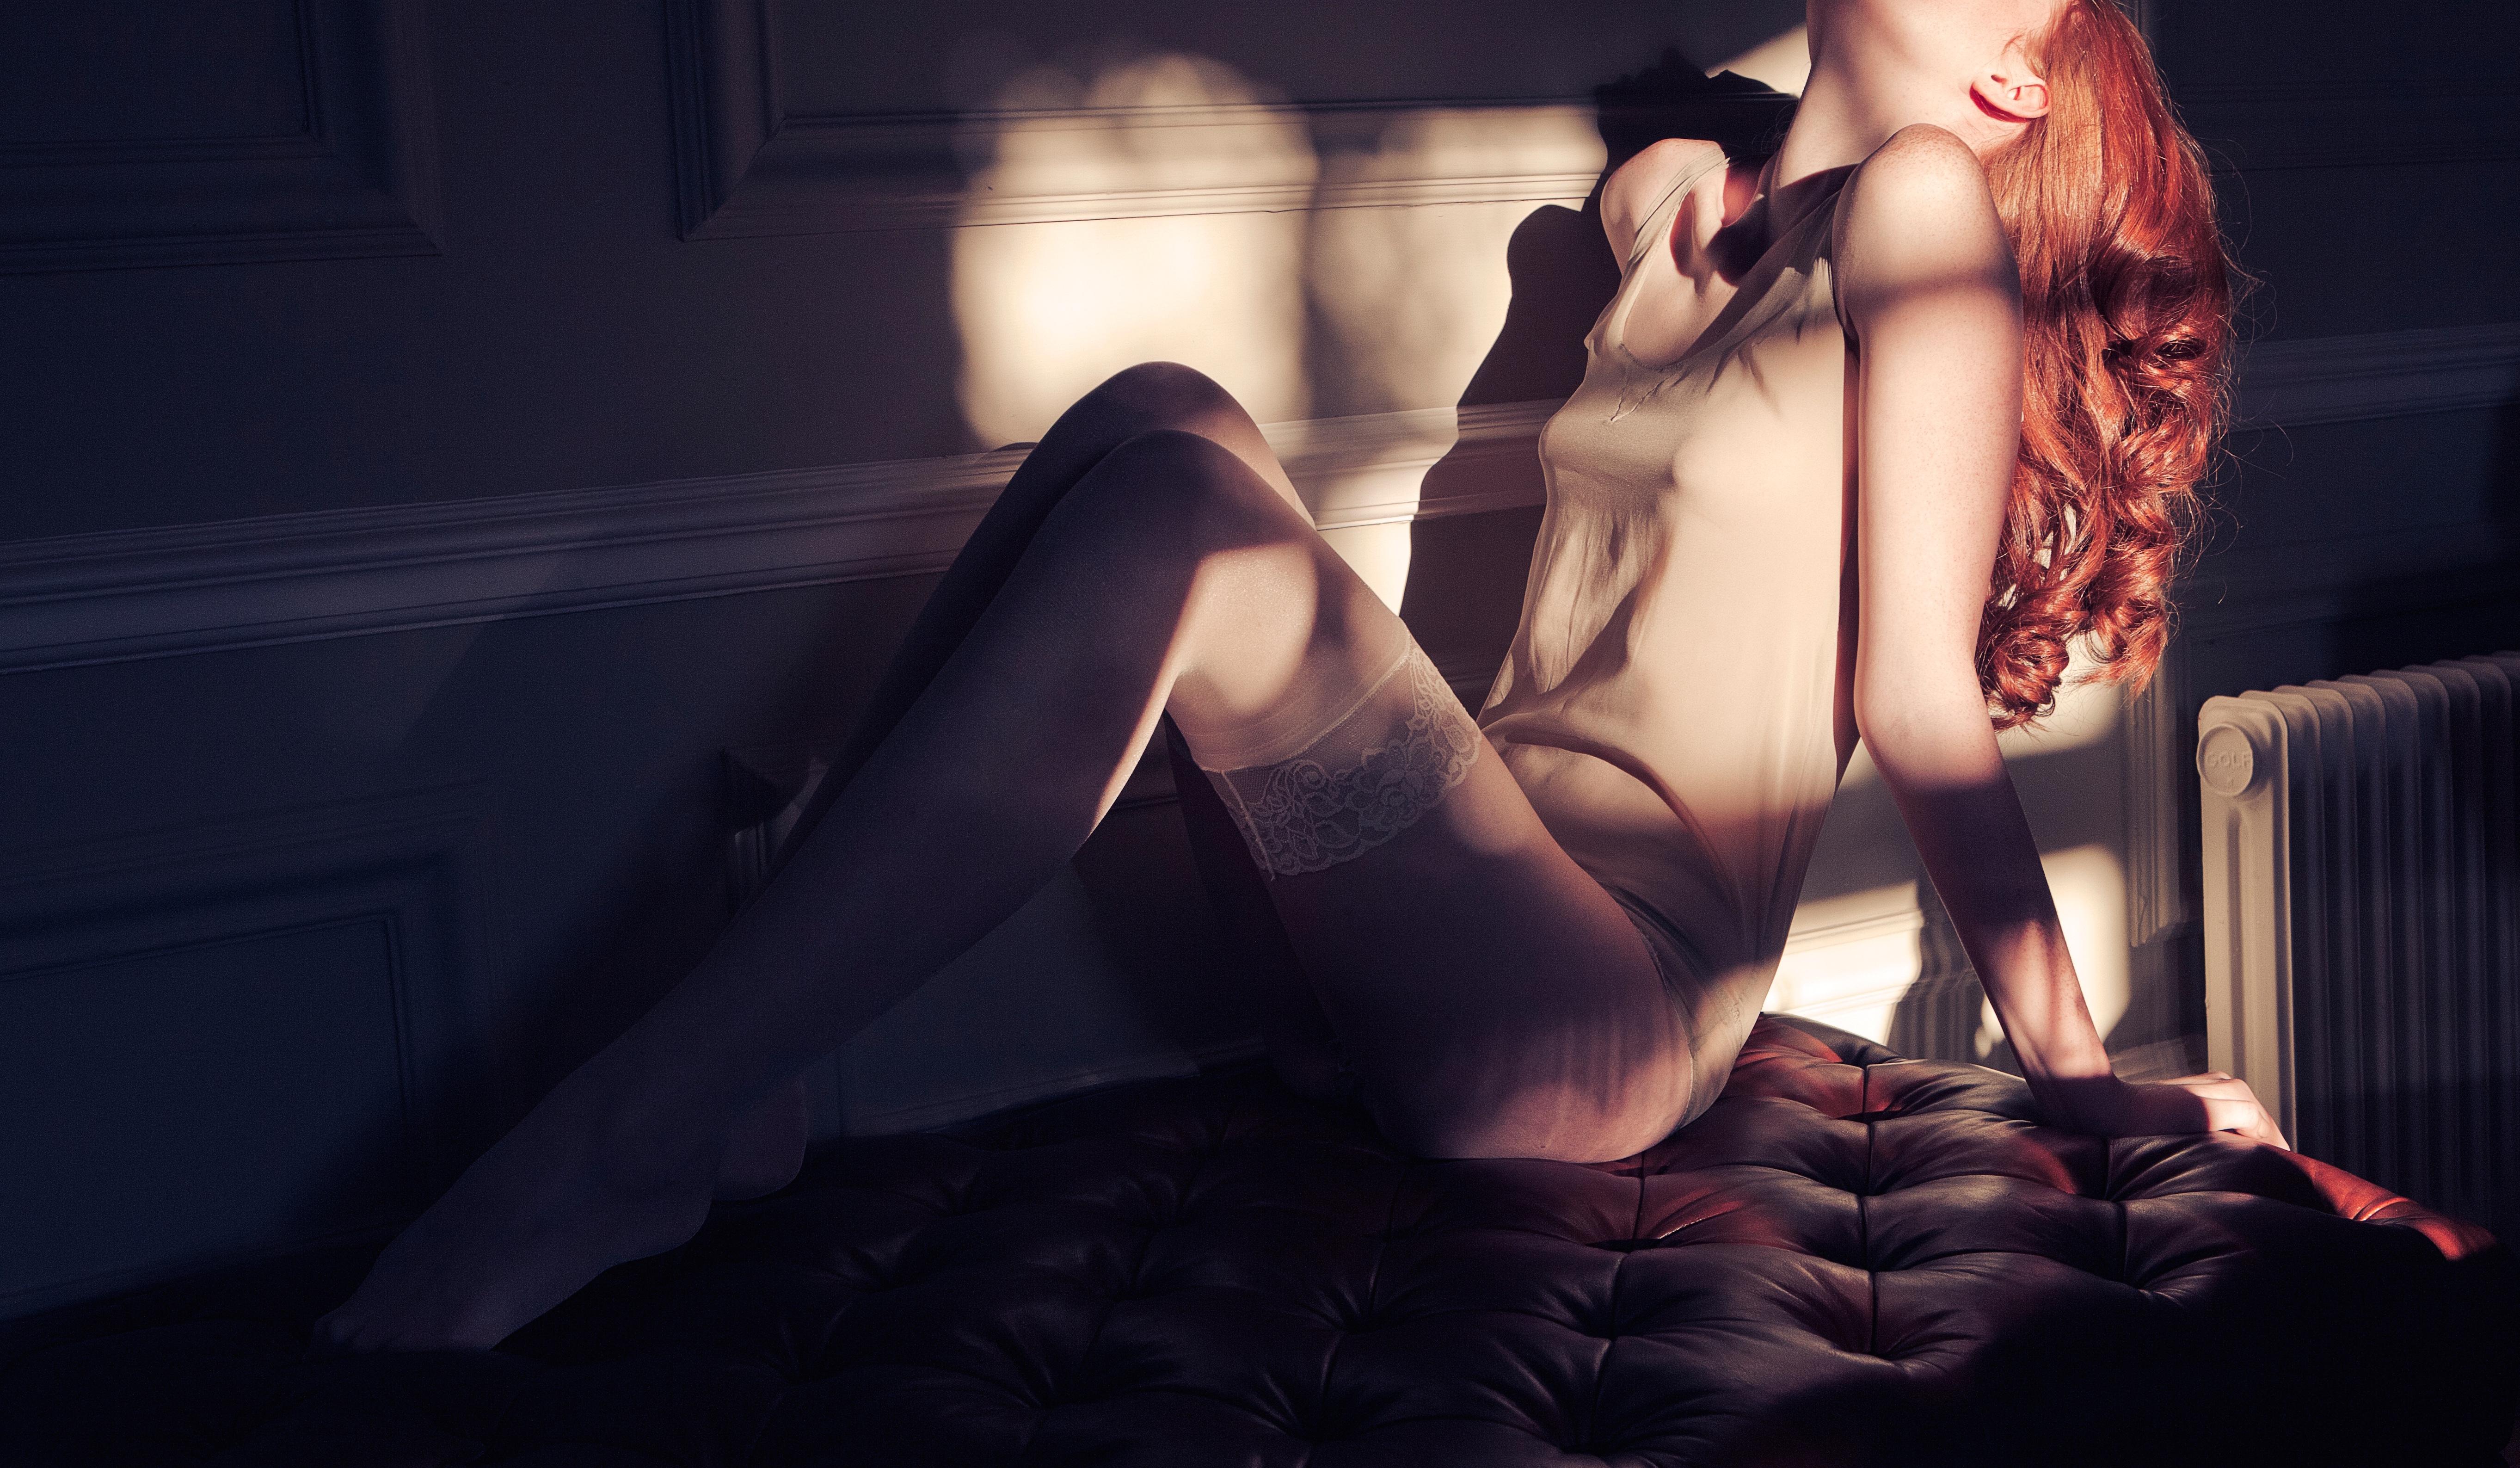 Woman posing sensually